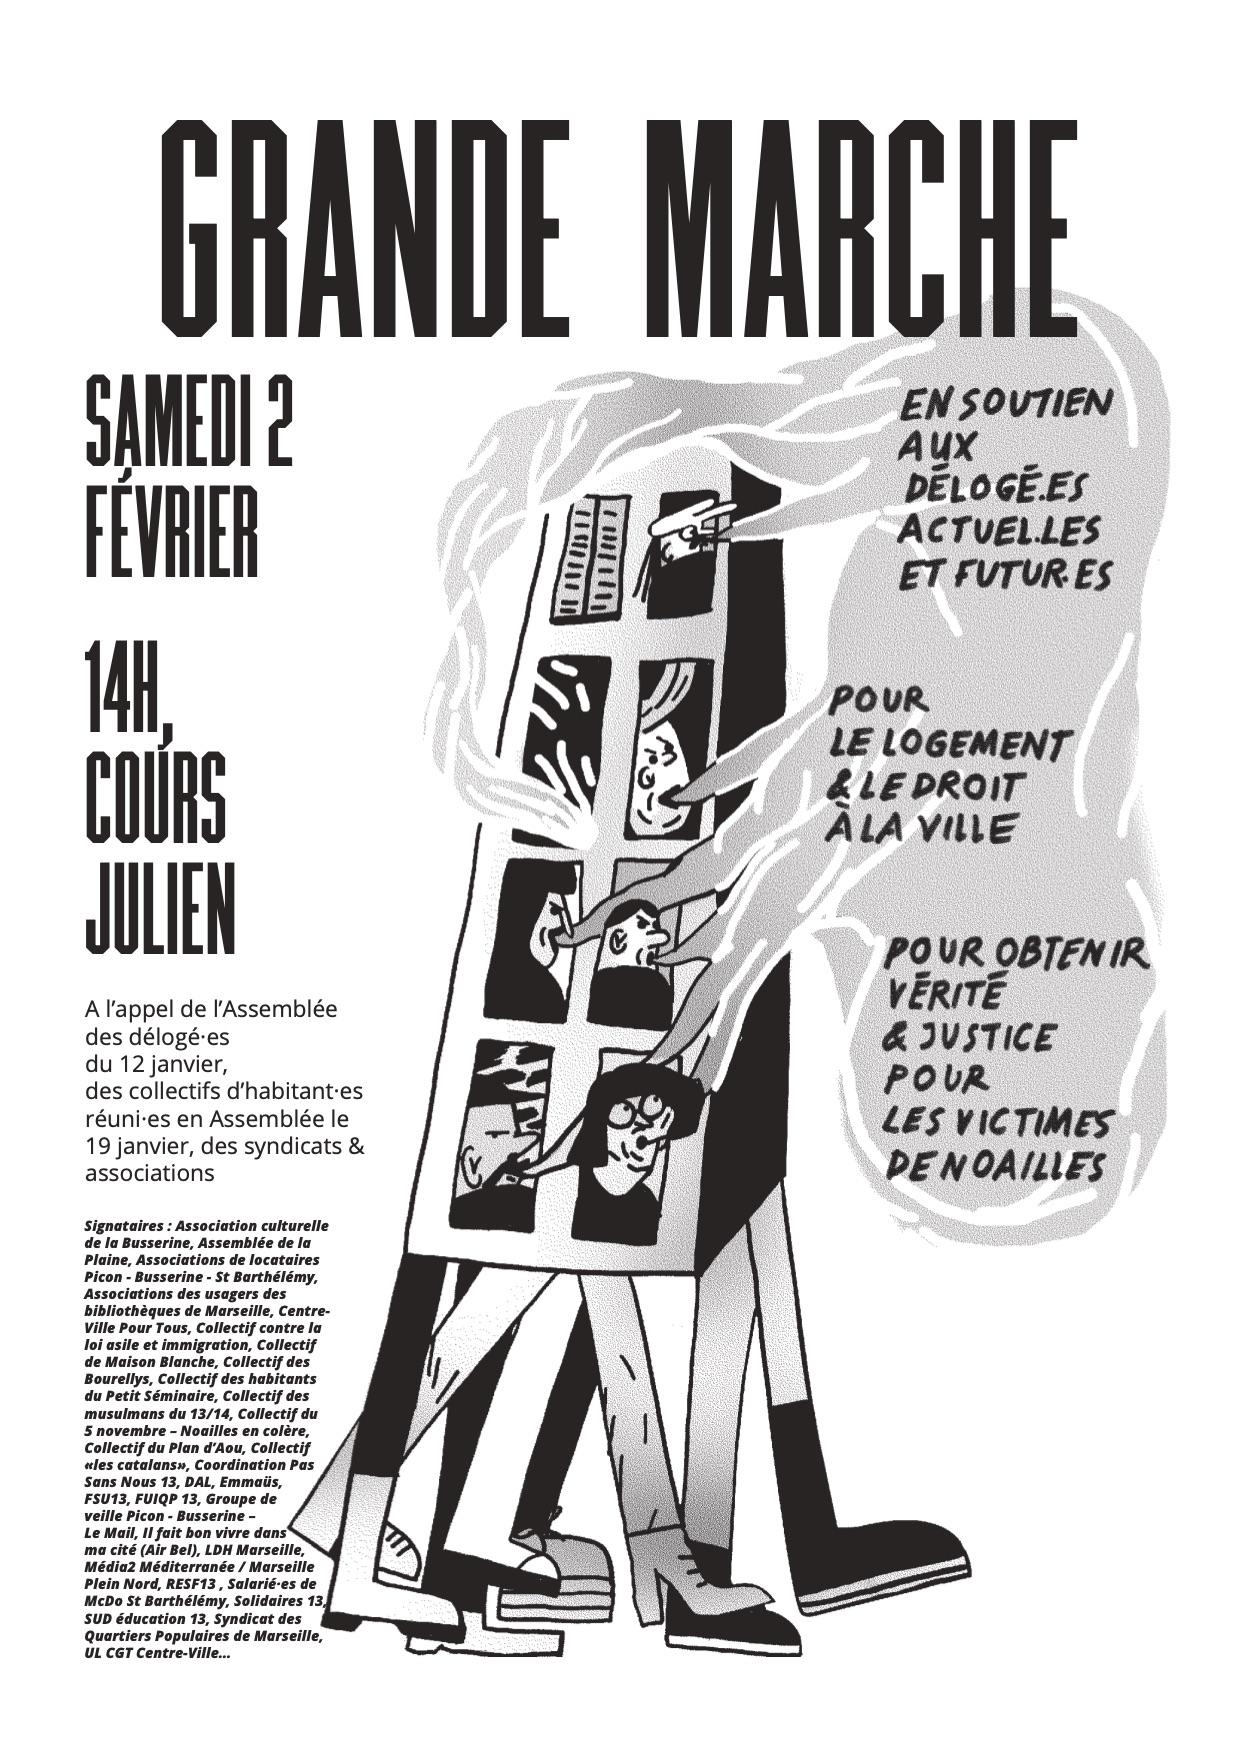 Grande Marche 2 fev 19